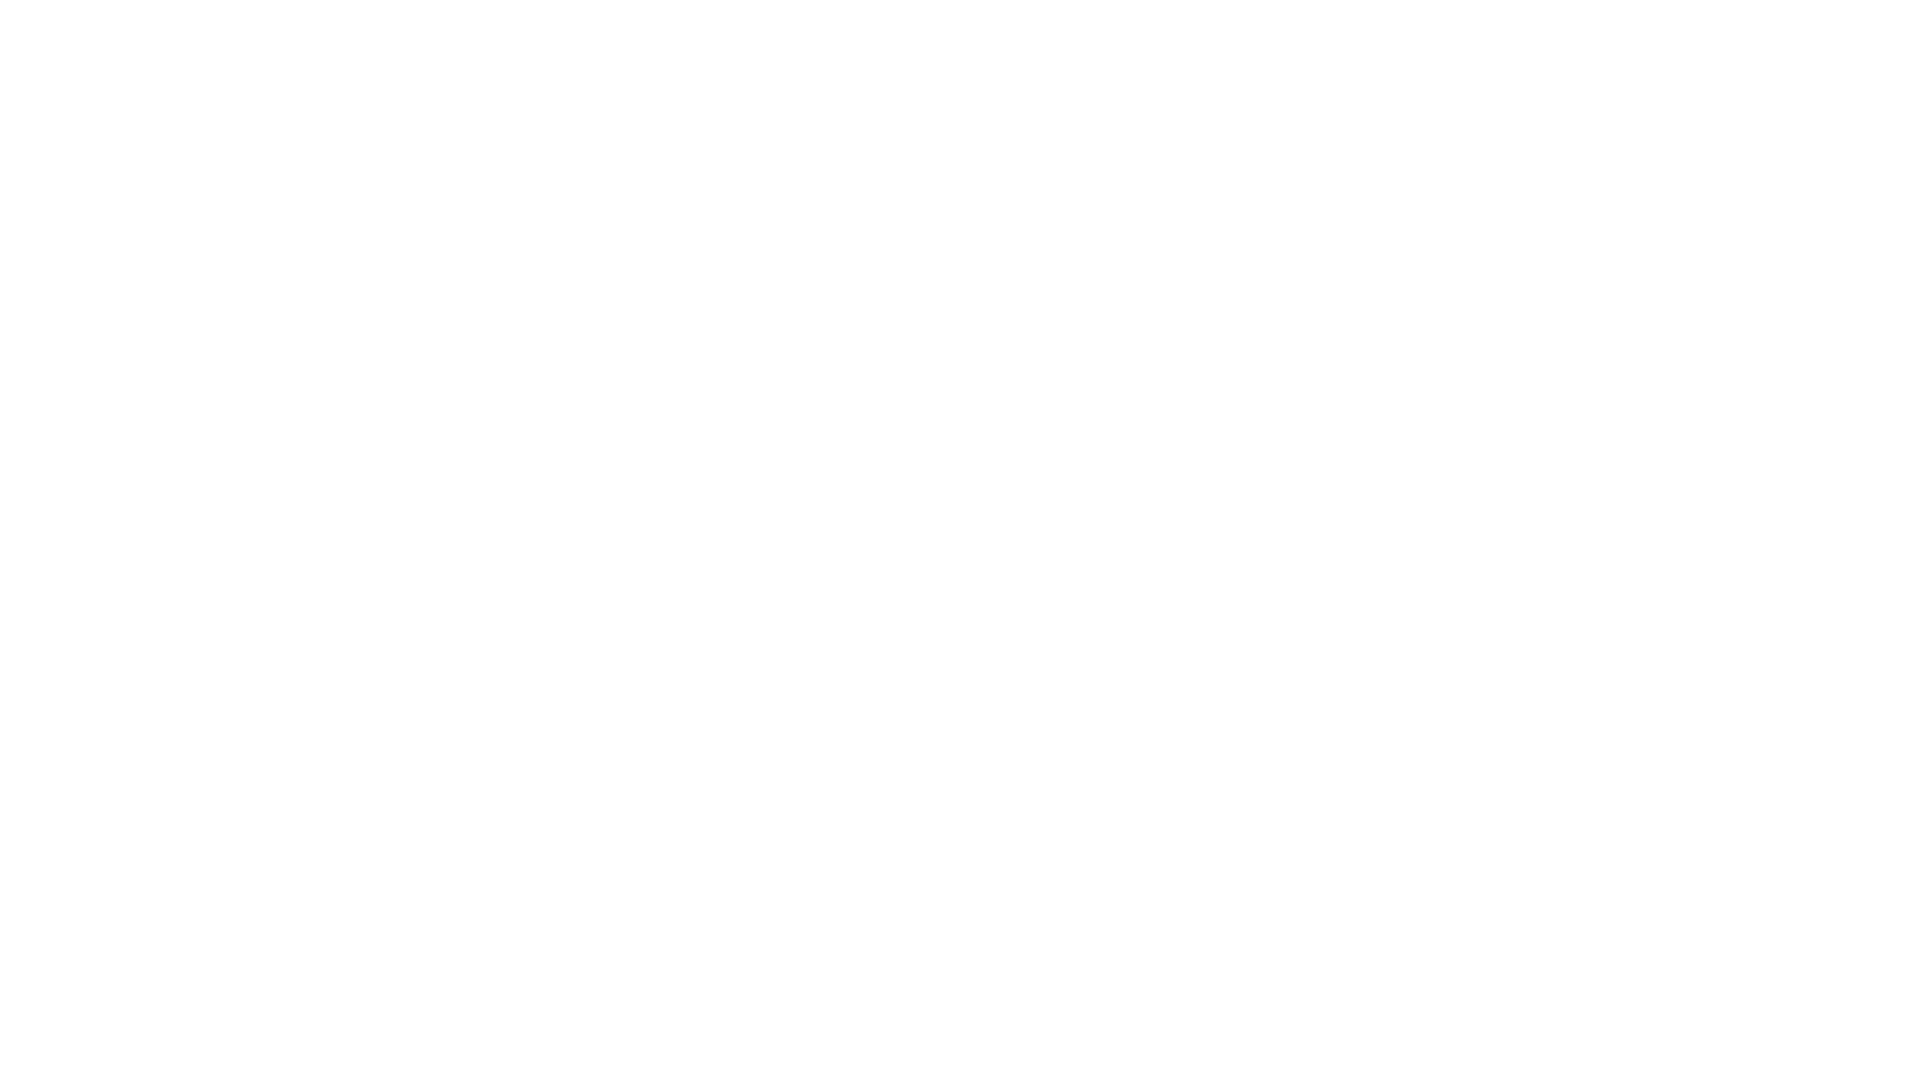 Blank-opacity